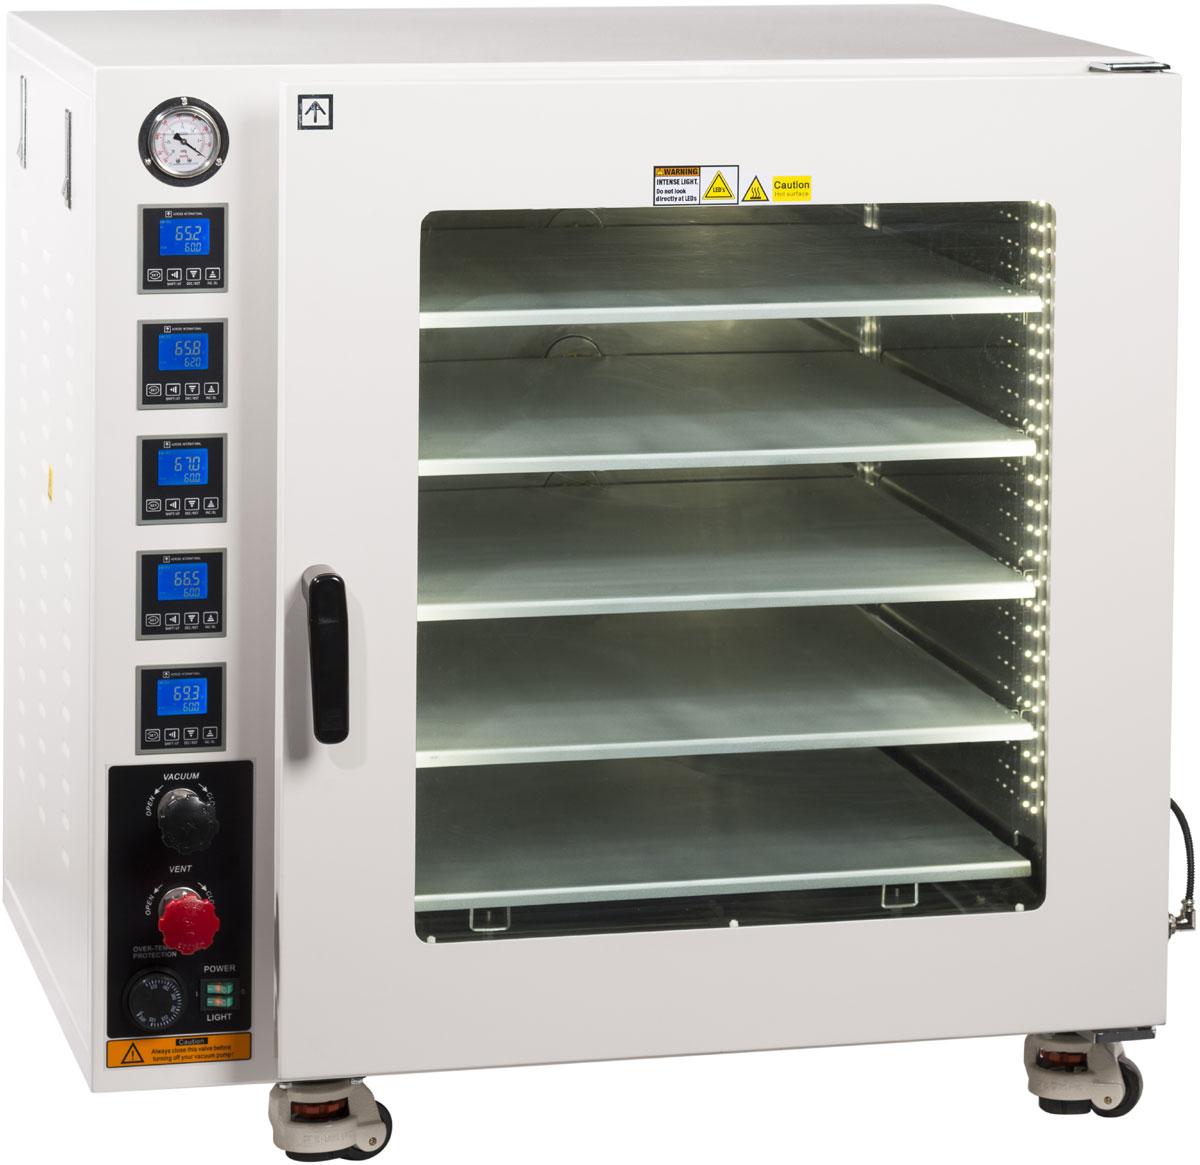 BHO Vacuum Ovens - Purge The Best Top-shelf Shatter